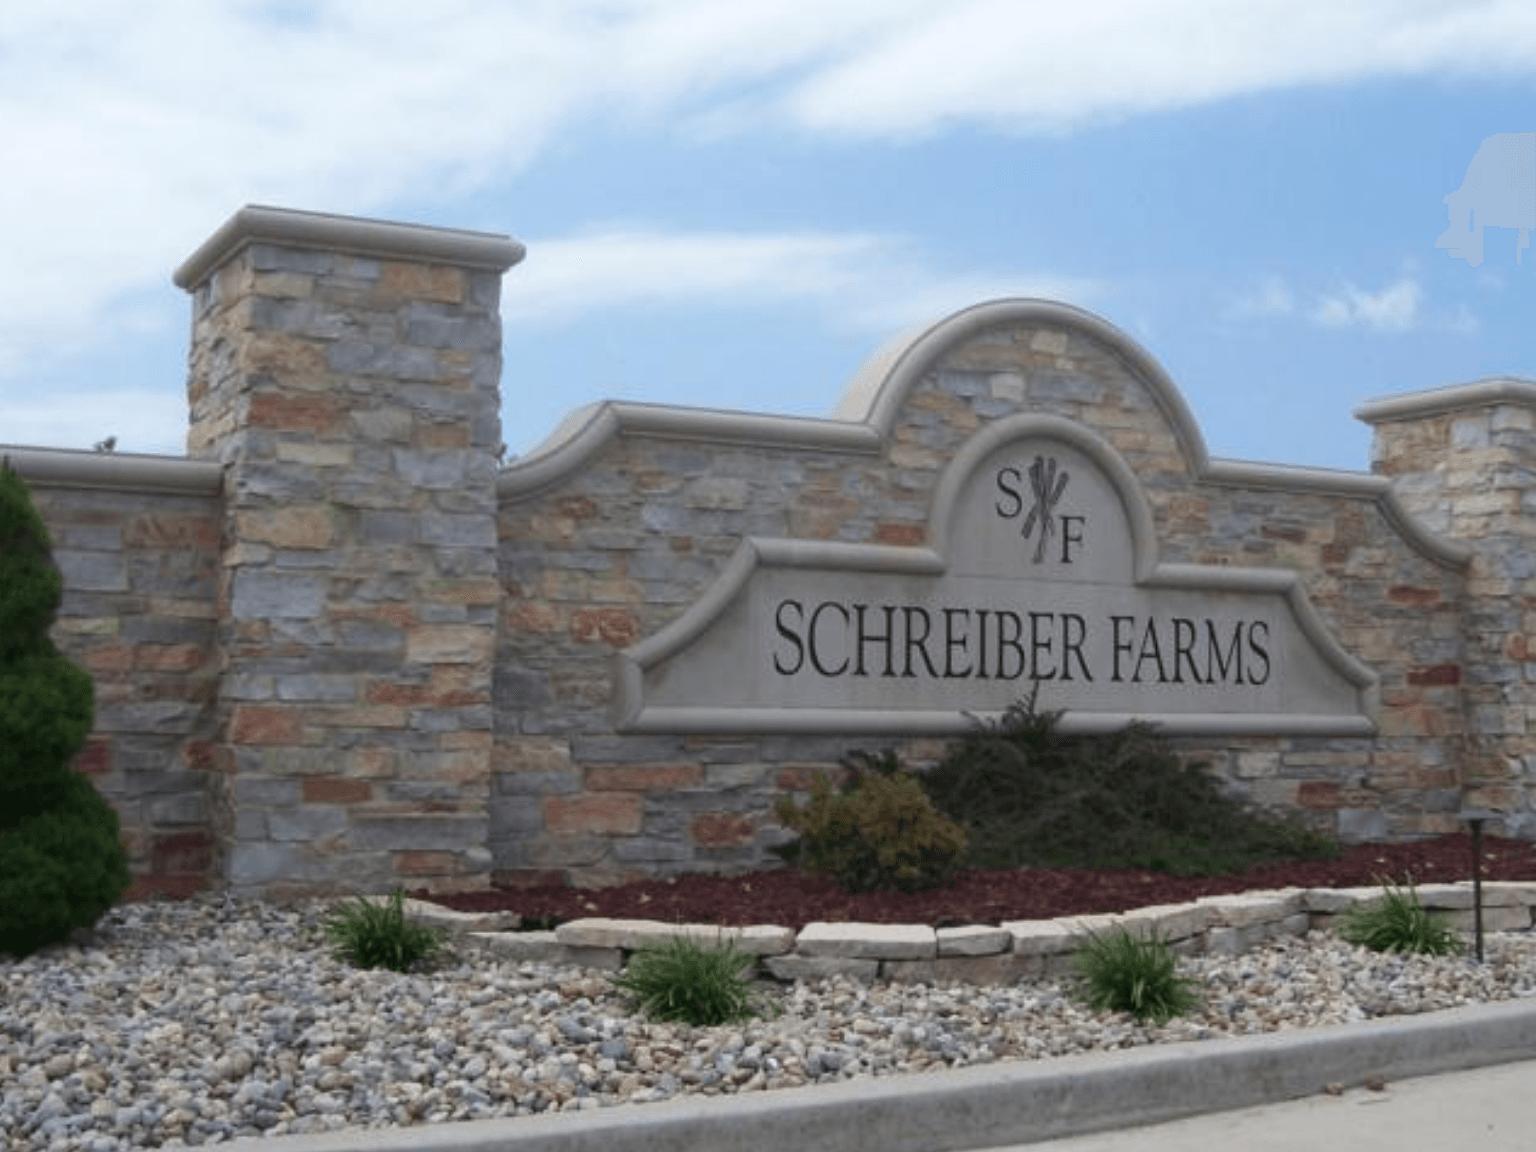 'Schreiber Farms' by C.A. Jones, Inc. in St. Louis